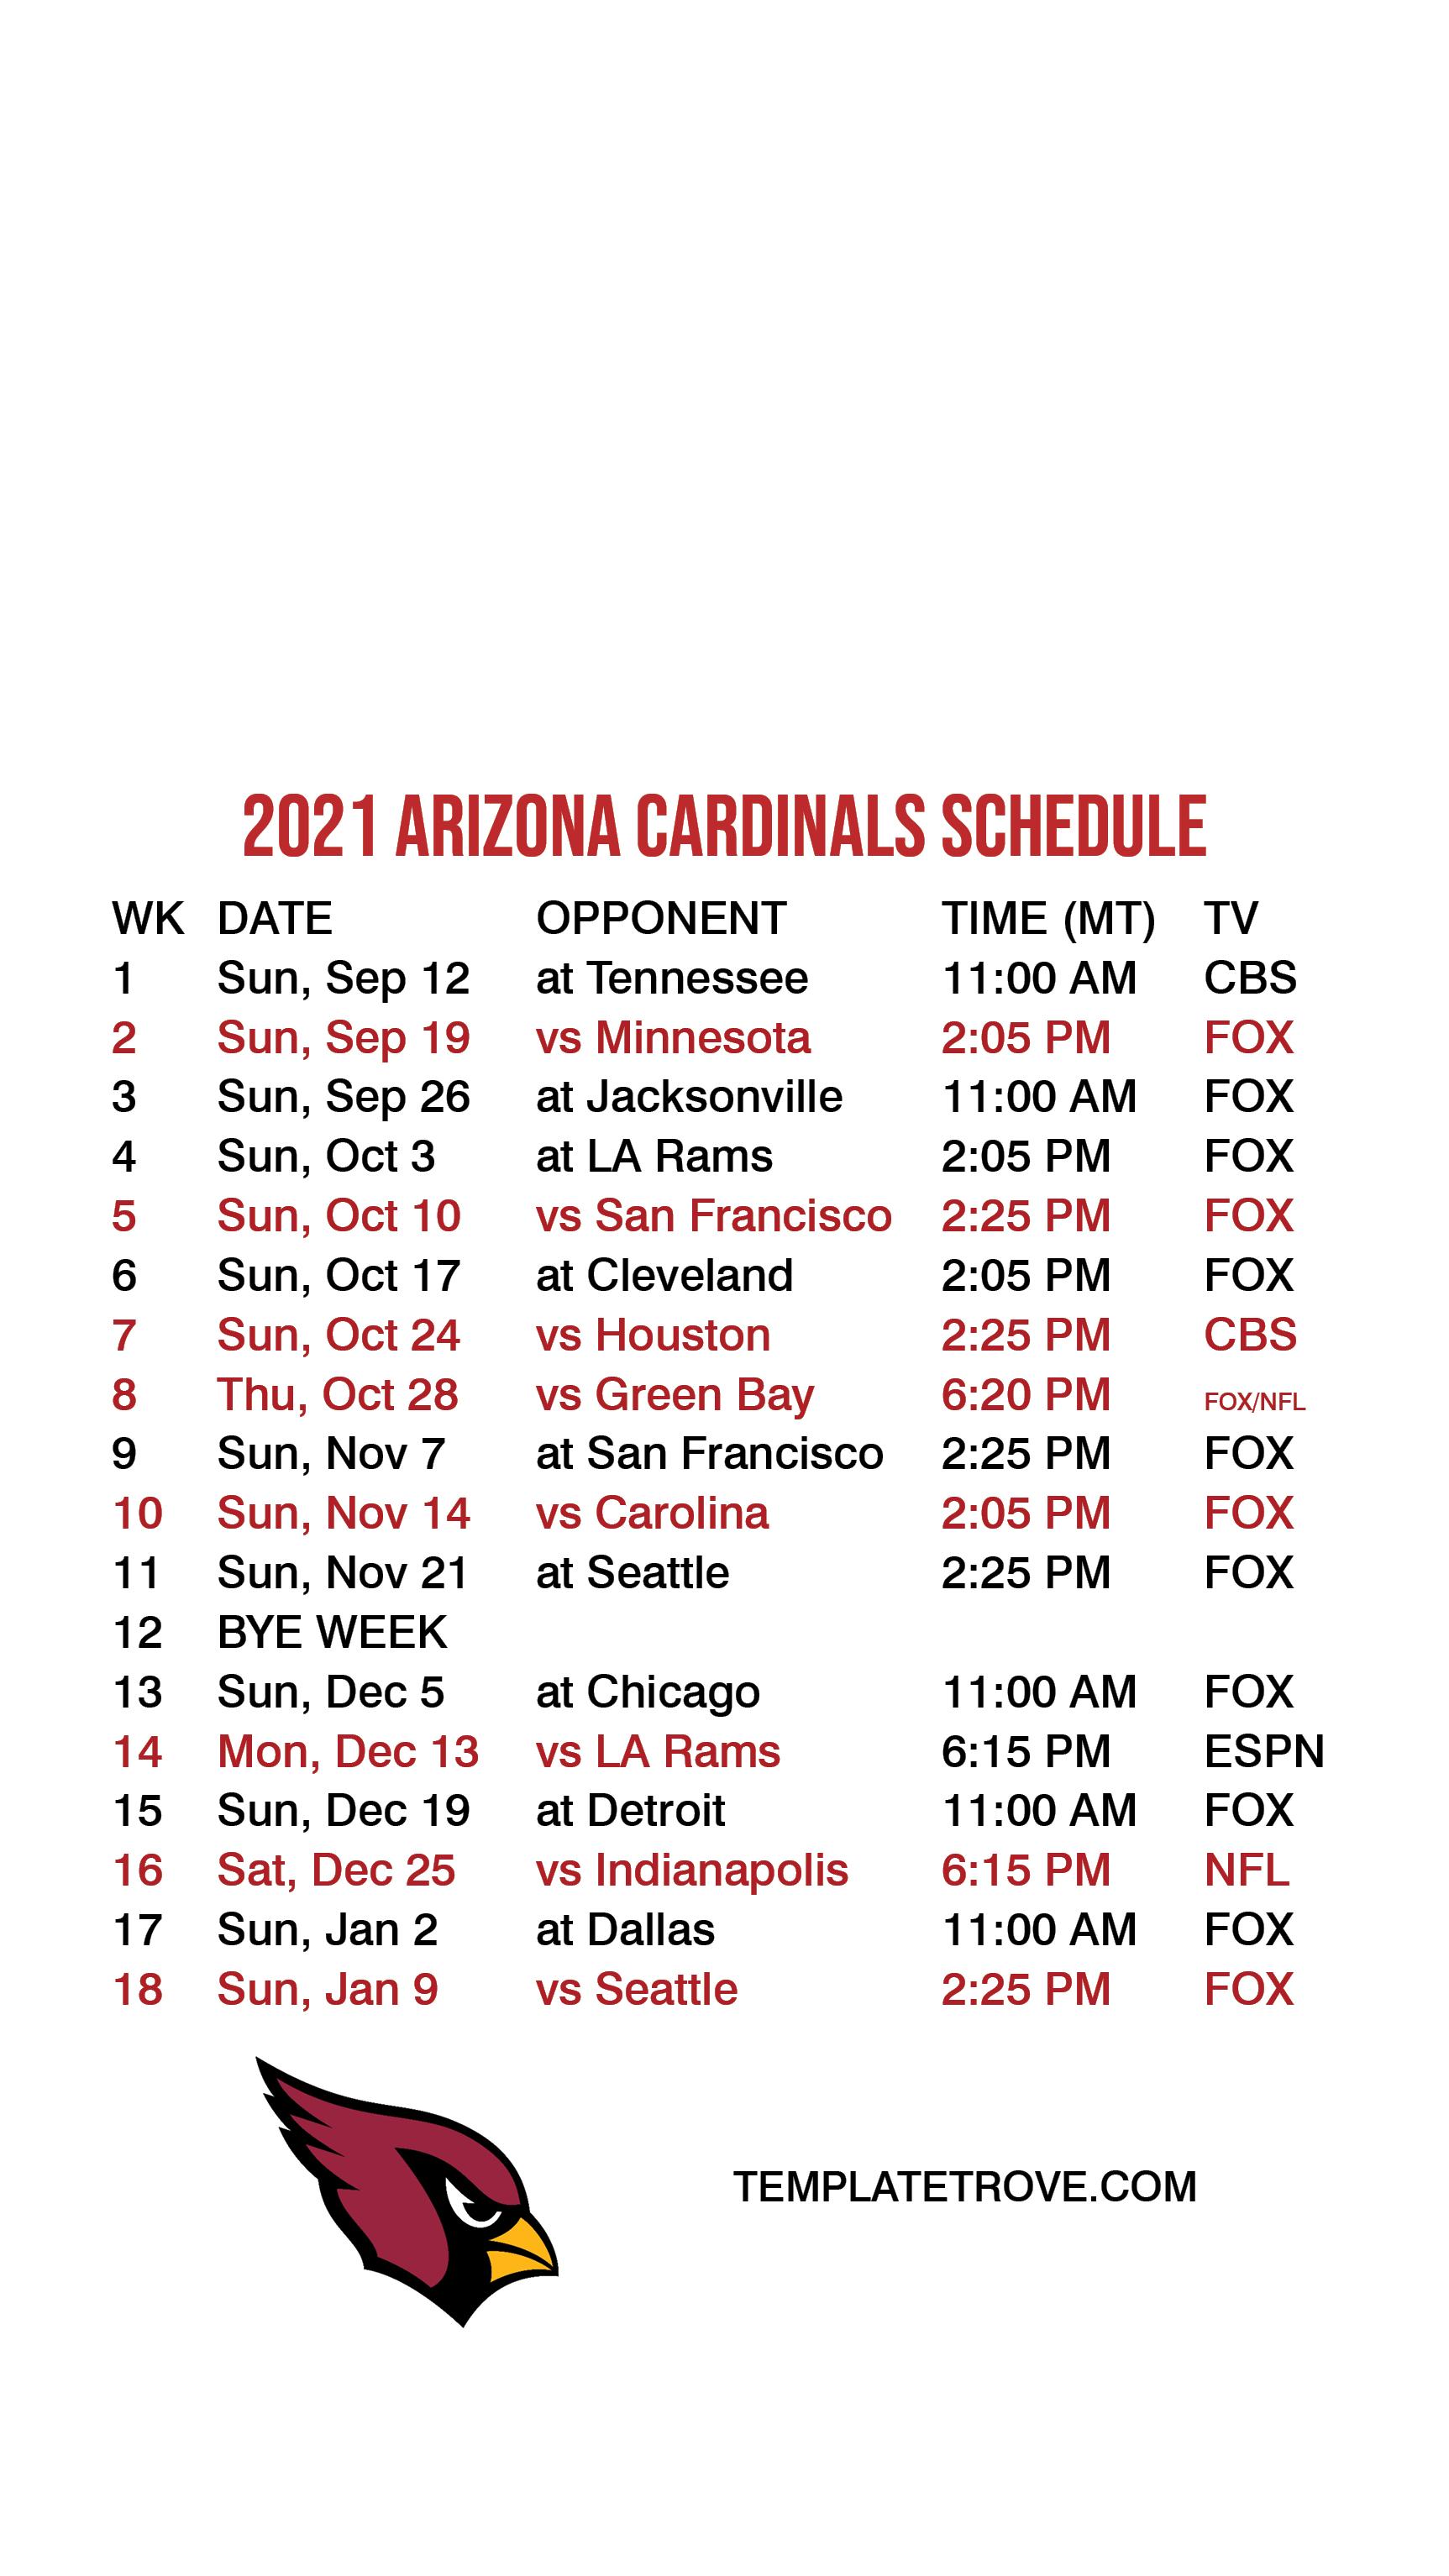 2021 2022 Arizona Cardinals Lock Screen Schedule For Iphone 6 7 8 Plus